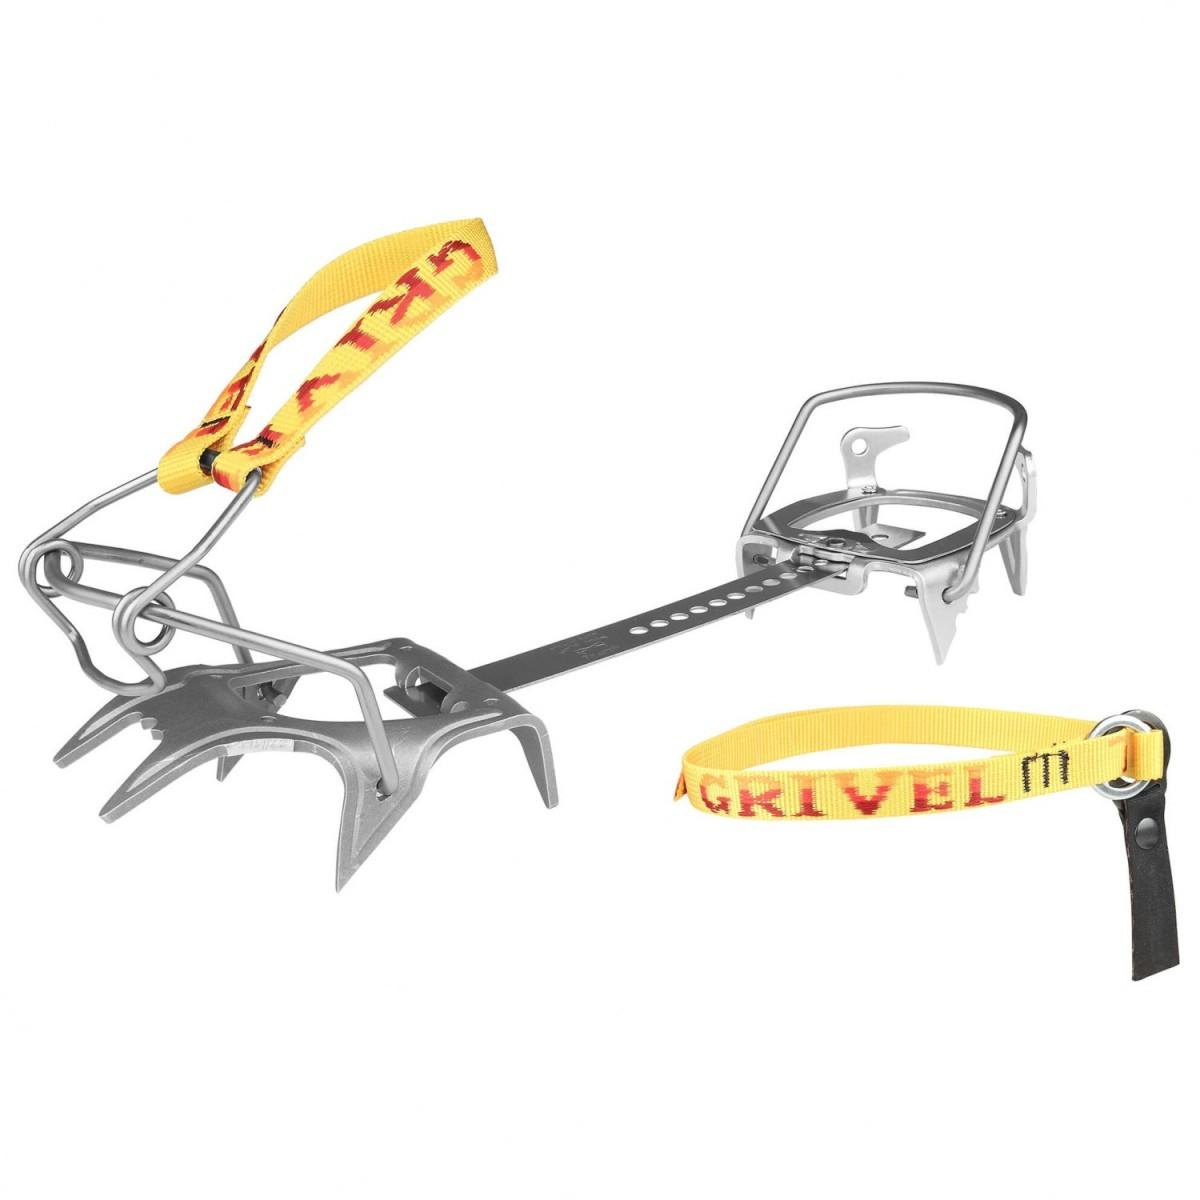 GRIVEL グリベル Ski Race Skimatic 2.0 with Crampon Safe S(Yellow / Silver)★ウインターギア・アイゼン・クランポン・雪山装備★